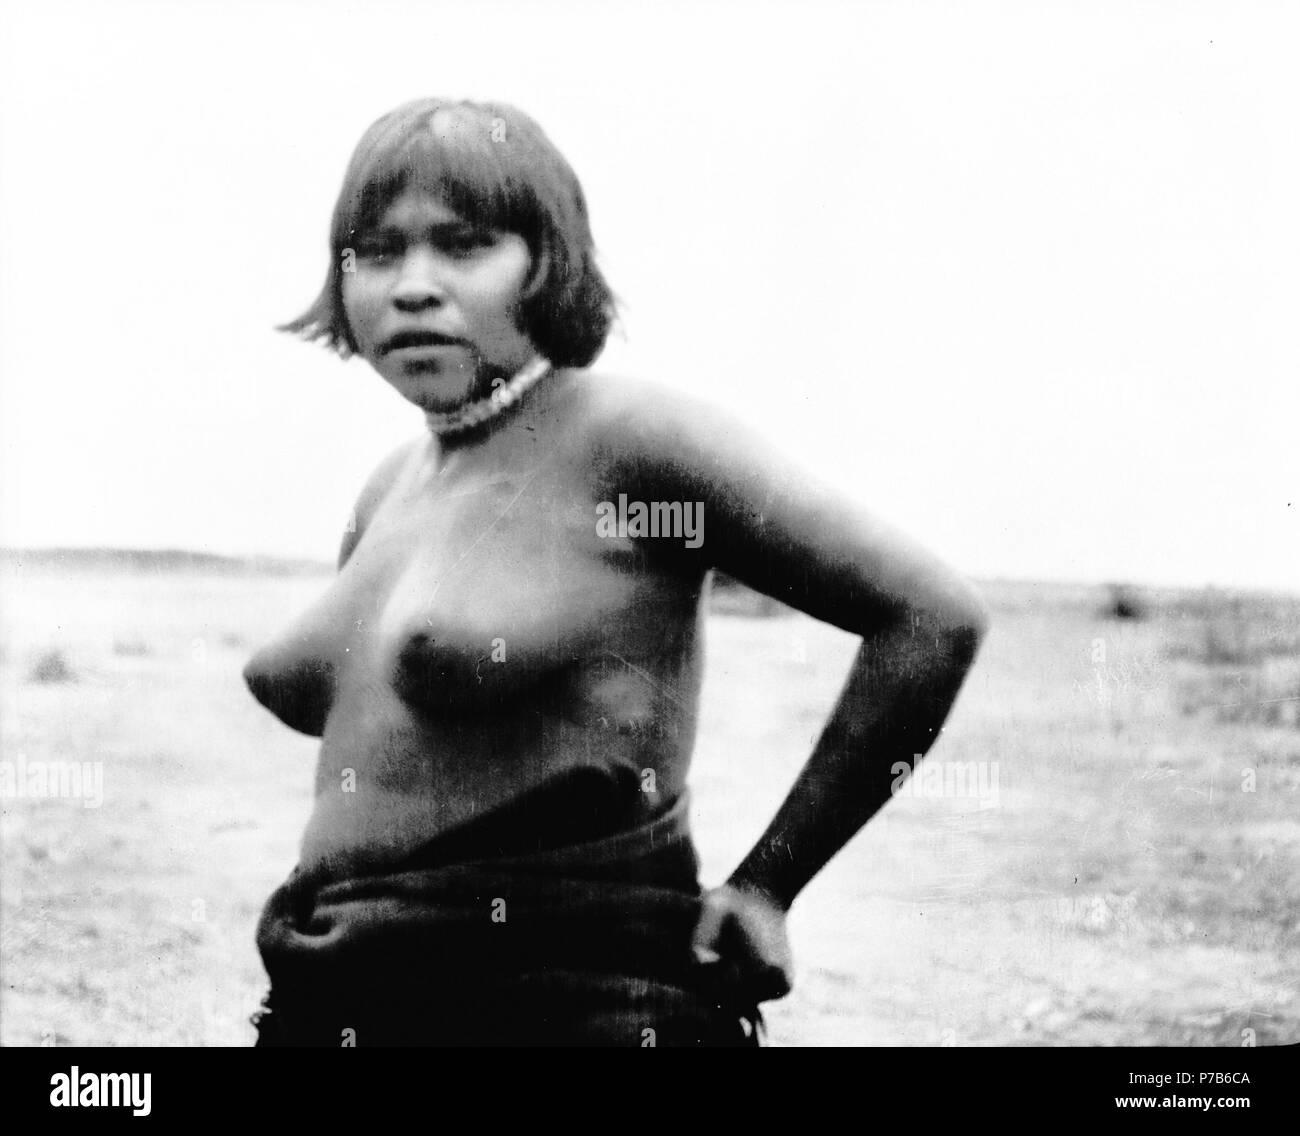 Svenska: Ung kvinna. Rio Pilcomayo, Bolivianska Chaco. Ashluslay, Nivaclé. Gran Chaco, Rio Pilcomayo; Bolivia. Hernmarckska expeditionen (1908–1909). English: Nivaclé people (Q3443961), Nivaclé people (Q3443961). The Hernmarck expedition (1908–1909). 1908 223 Ung kvinna. Rio Pilcomayo, Bolivianska Chaco. Gran Chaco, Rio Pilcomayo - SMVK - 004684 Stock Photo